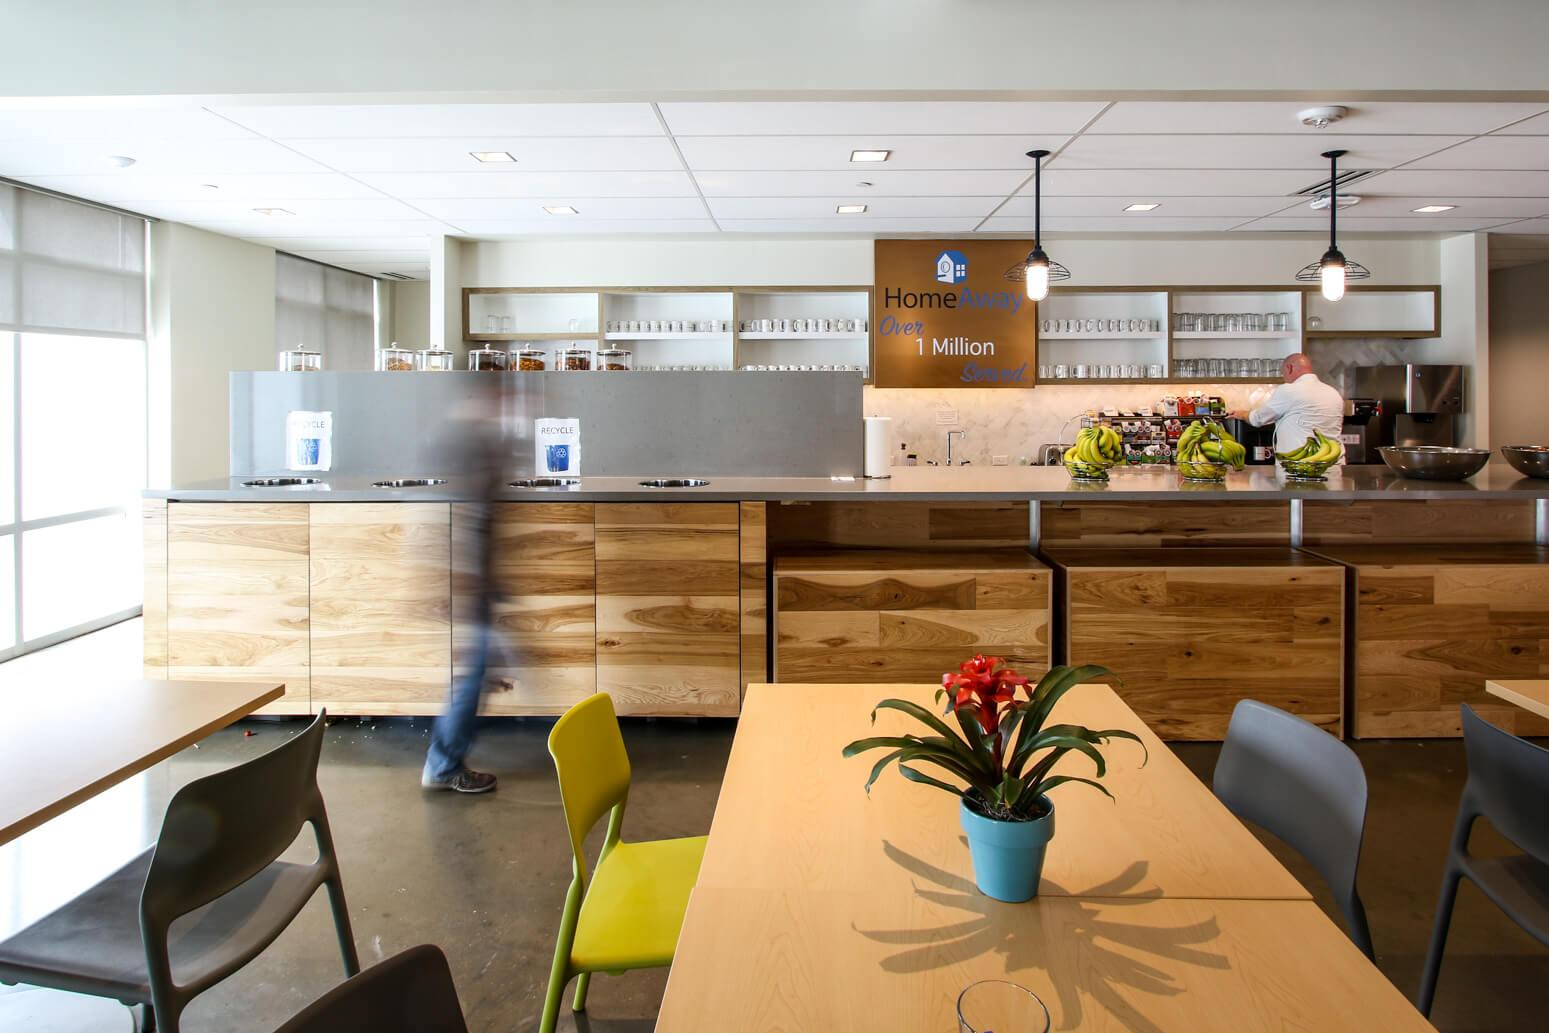 HomeAway Austin Office Killer Spaces-13